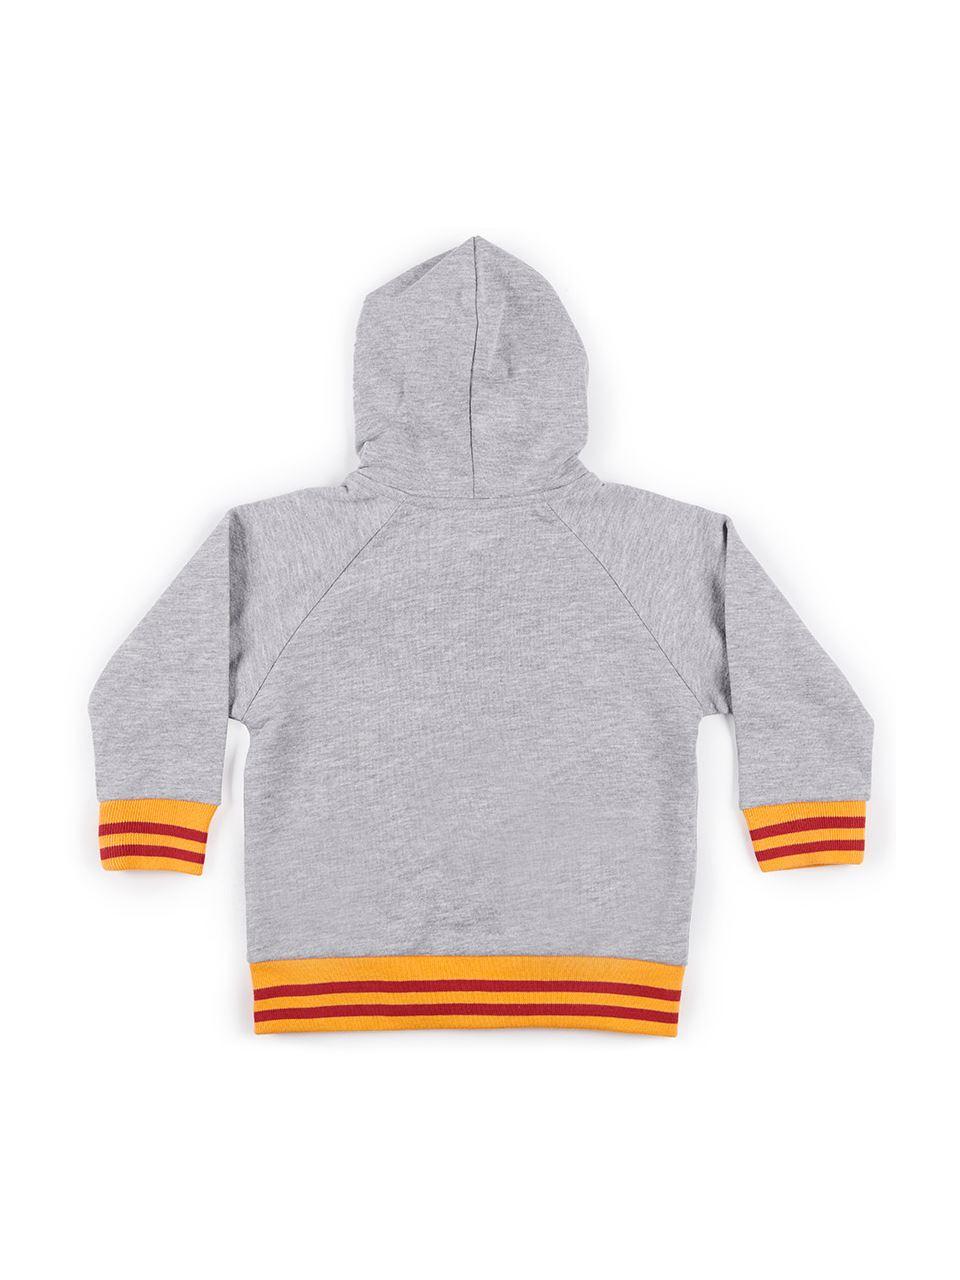 B192021 Sweatshirt